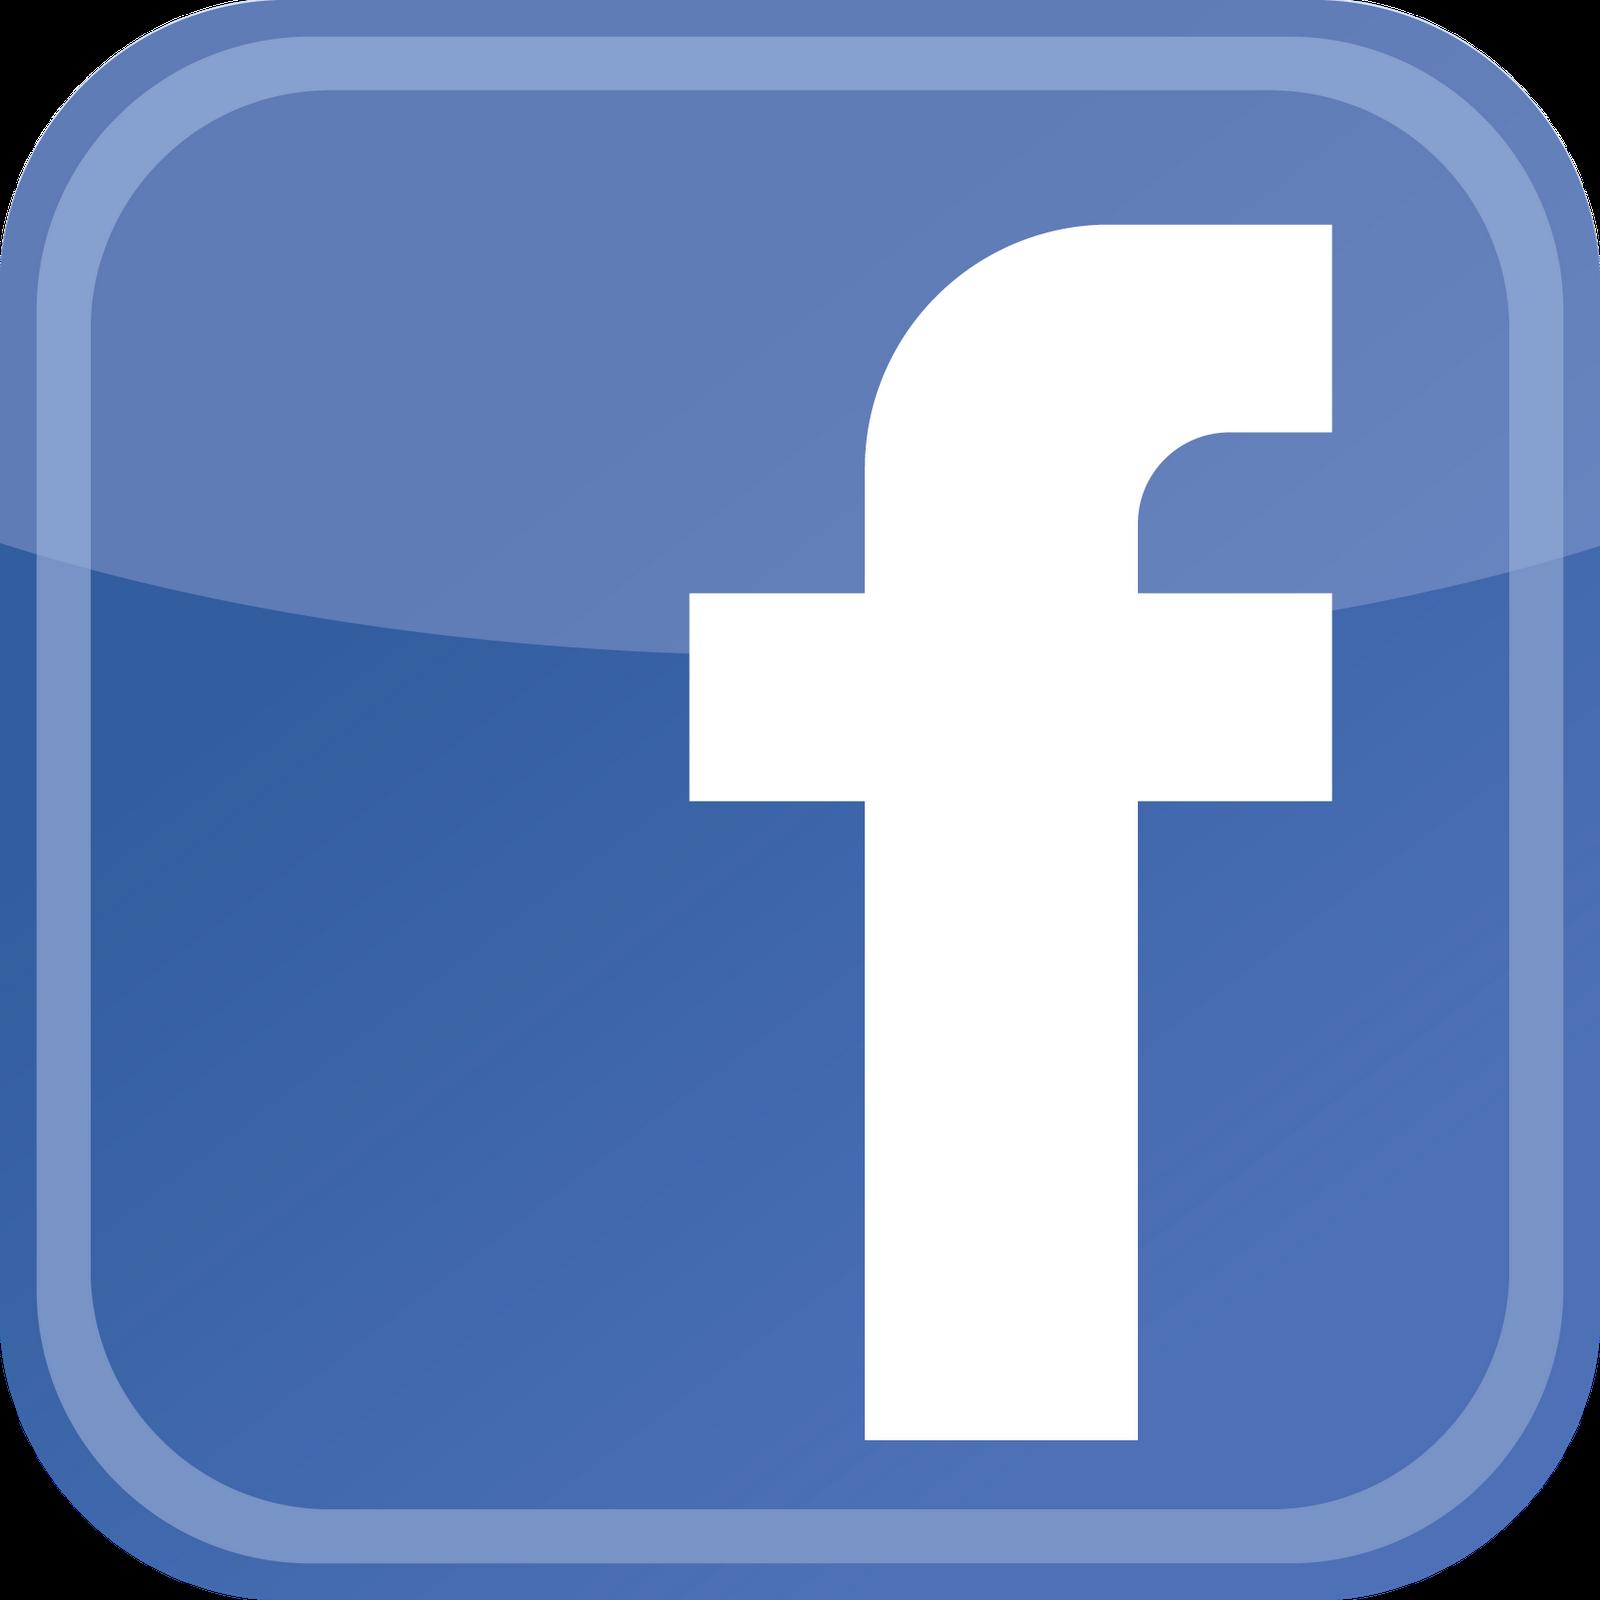 logo_facebook-80.png?nocache=1367594884318